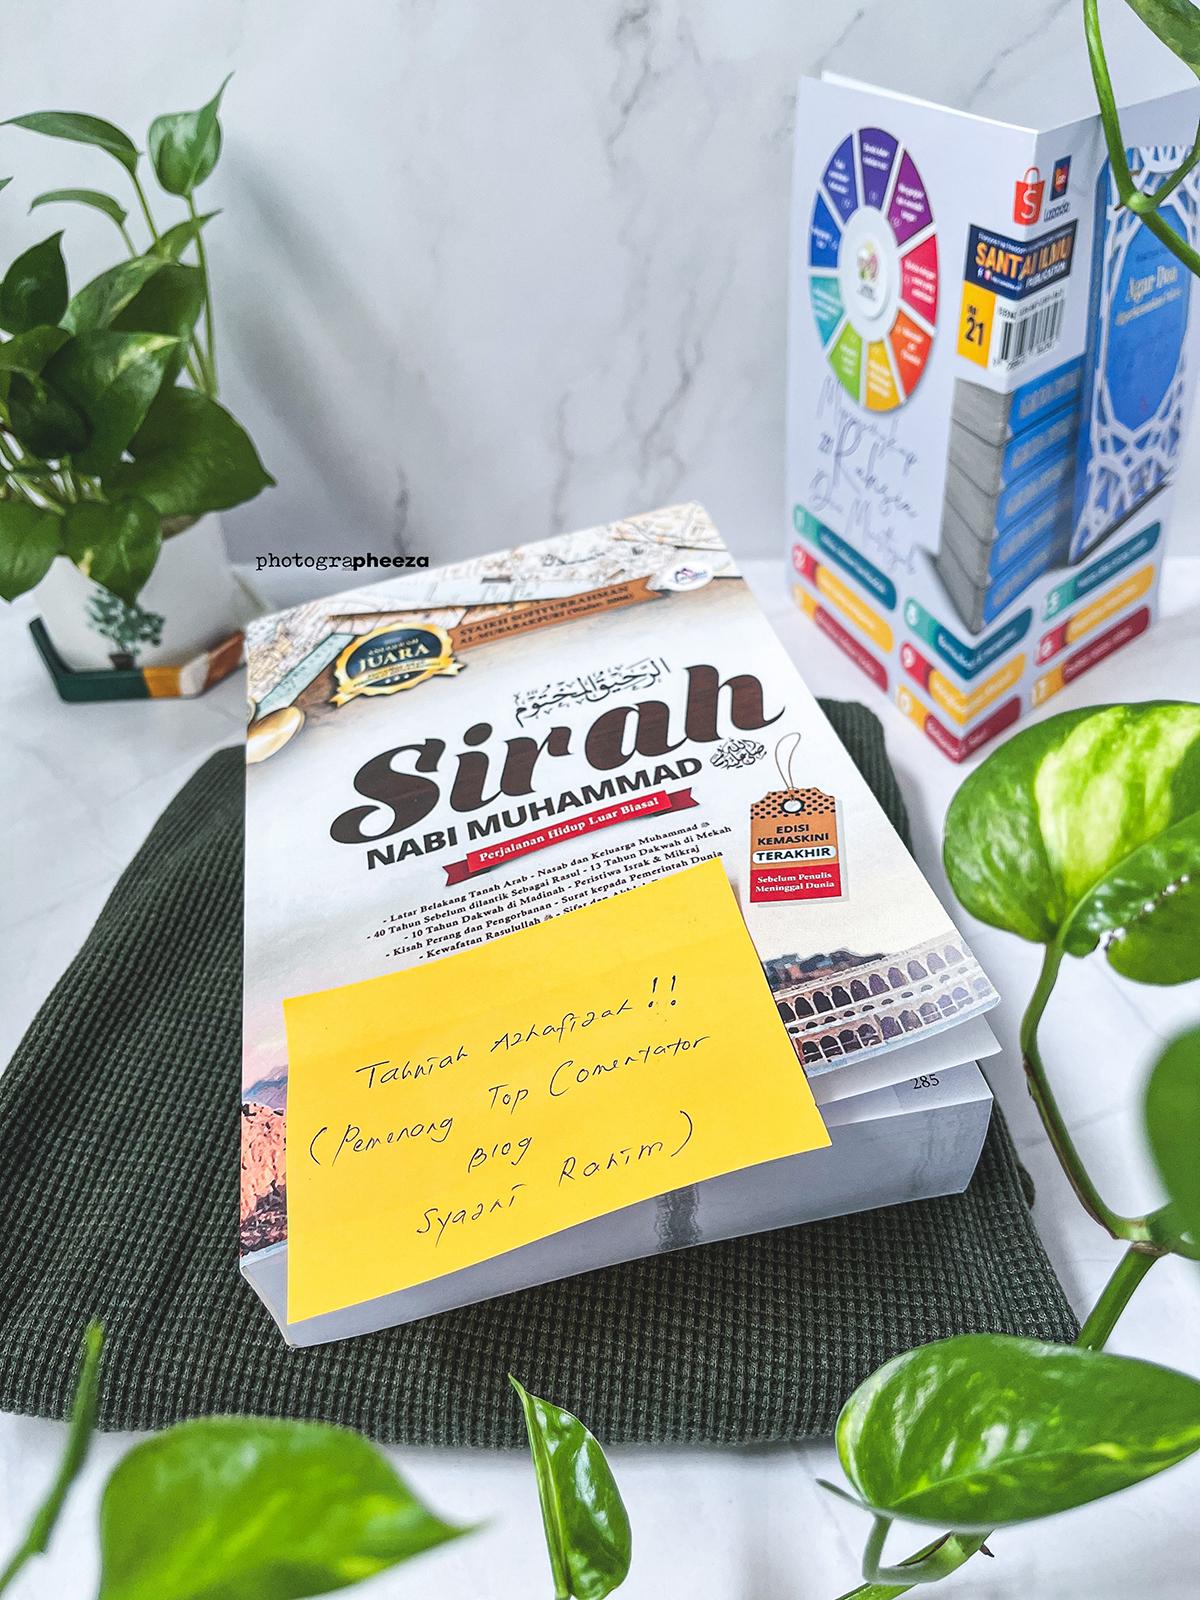 Hadiah Buku Sirah Nabi Muhammad SAW. Perjalanan Hidup Luar Biasa!